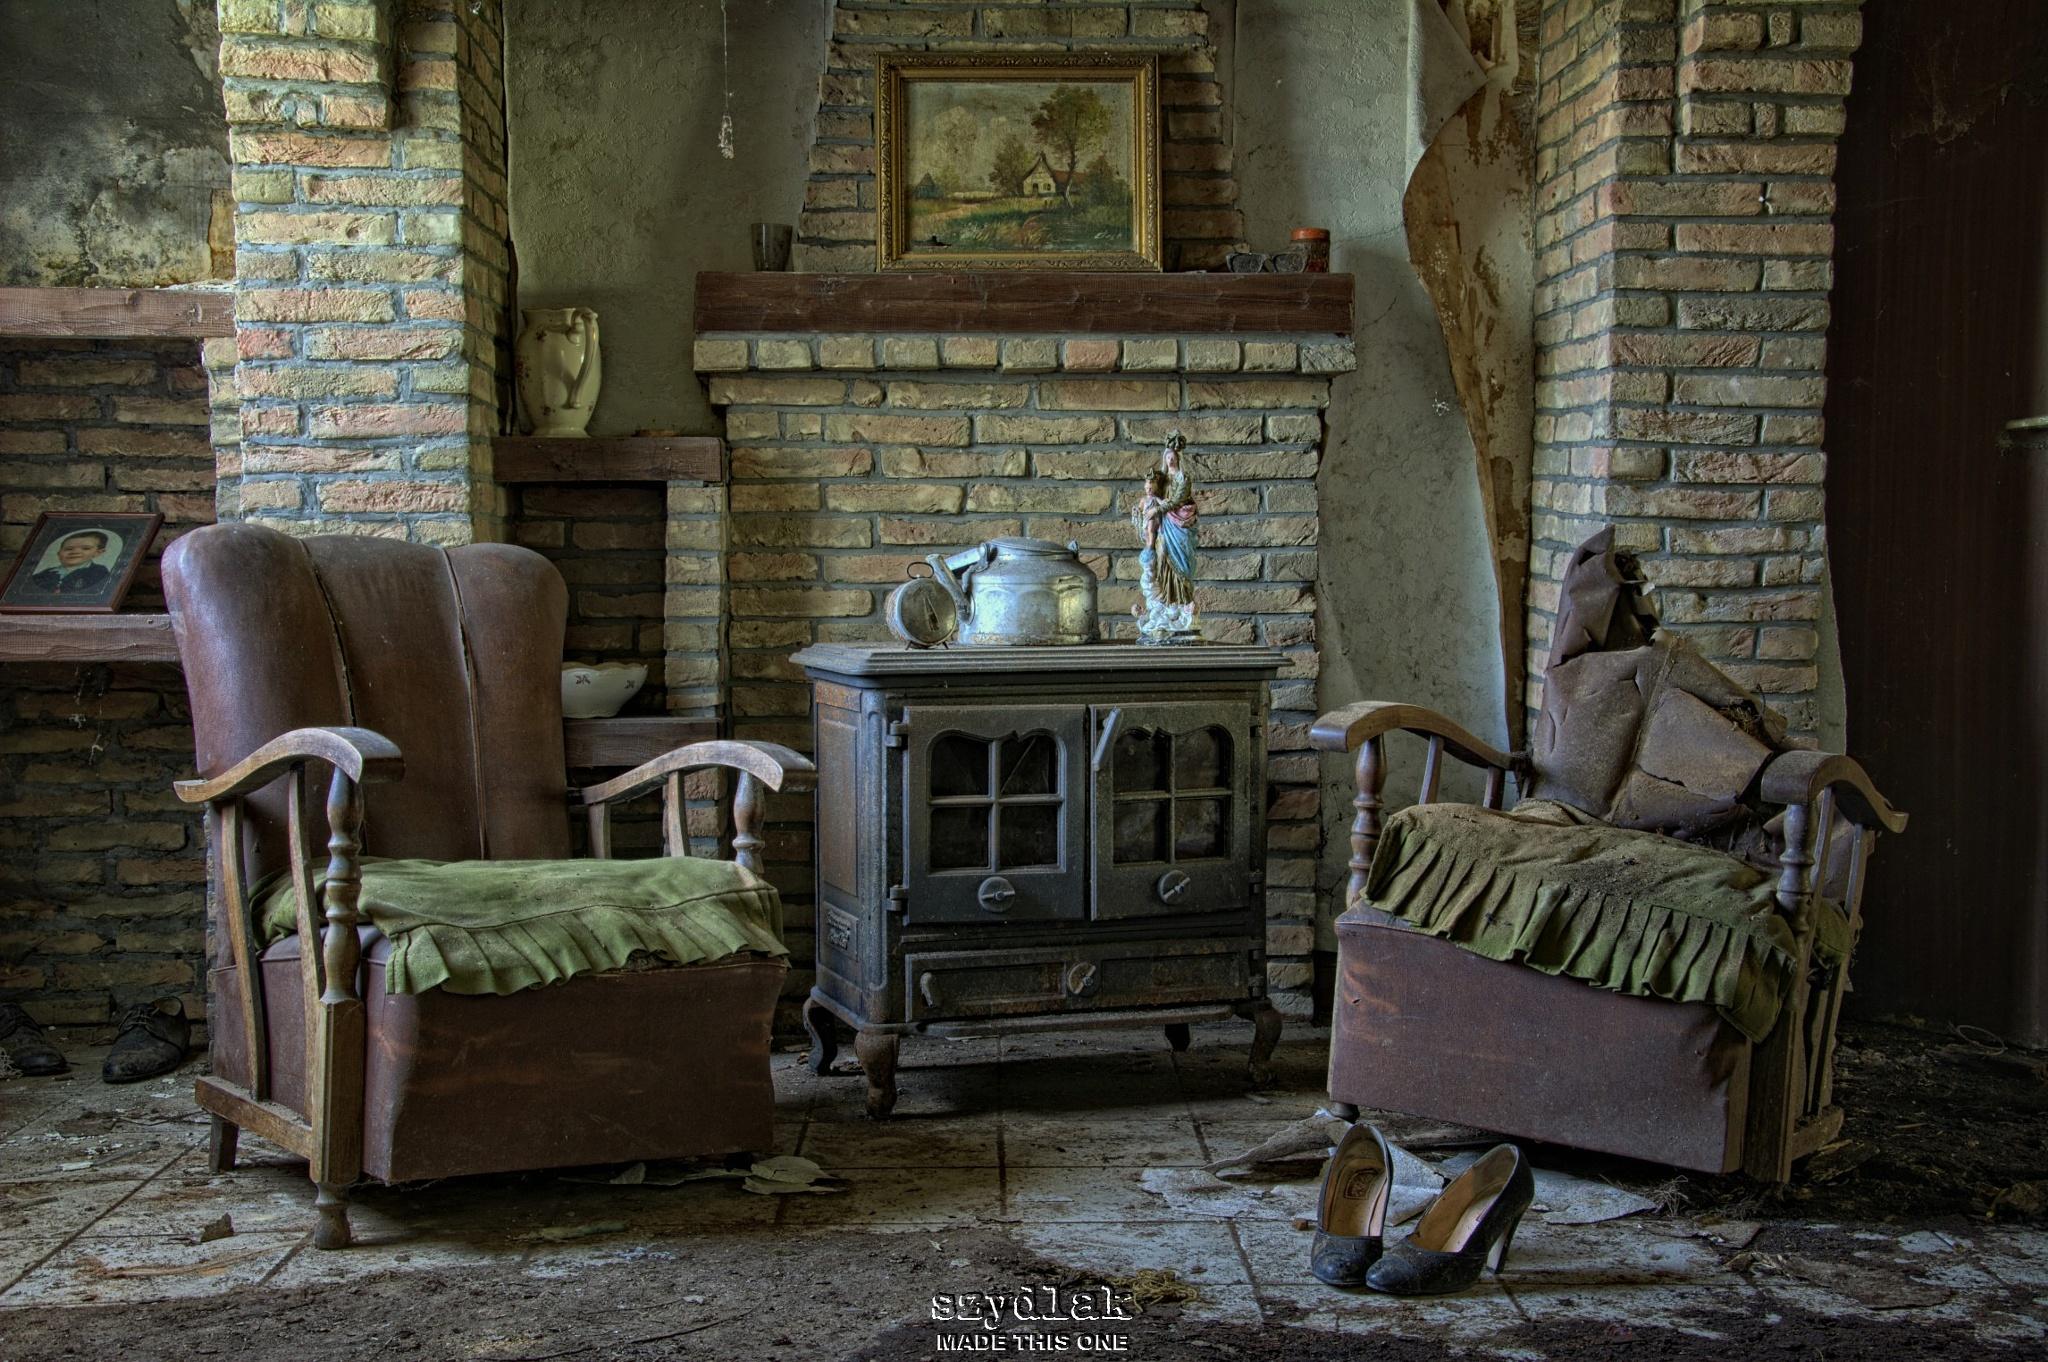 Home Sweet Home by szydlak